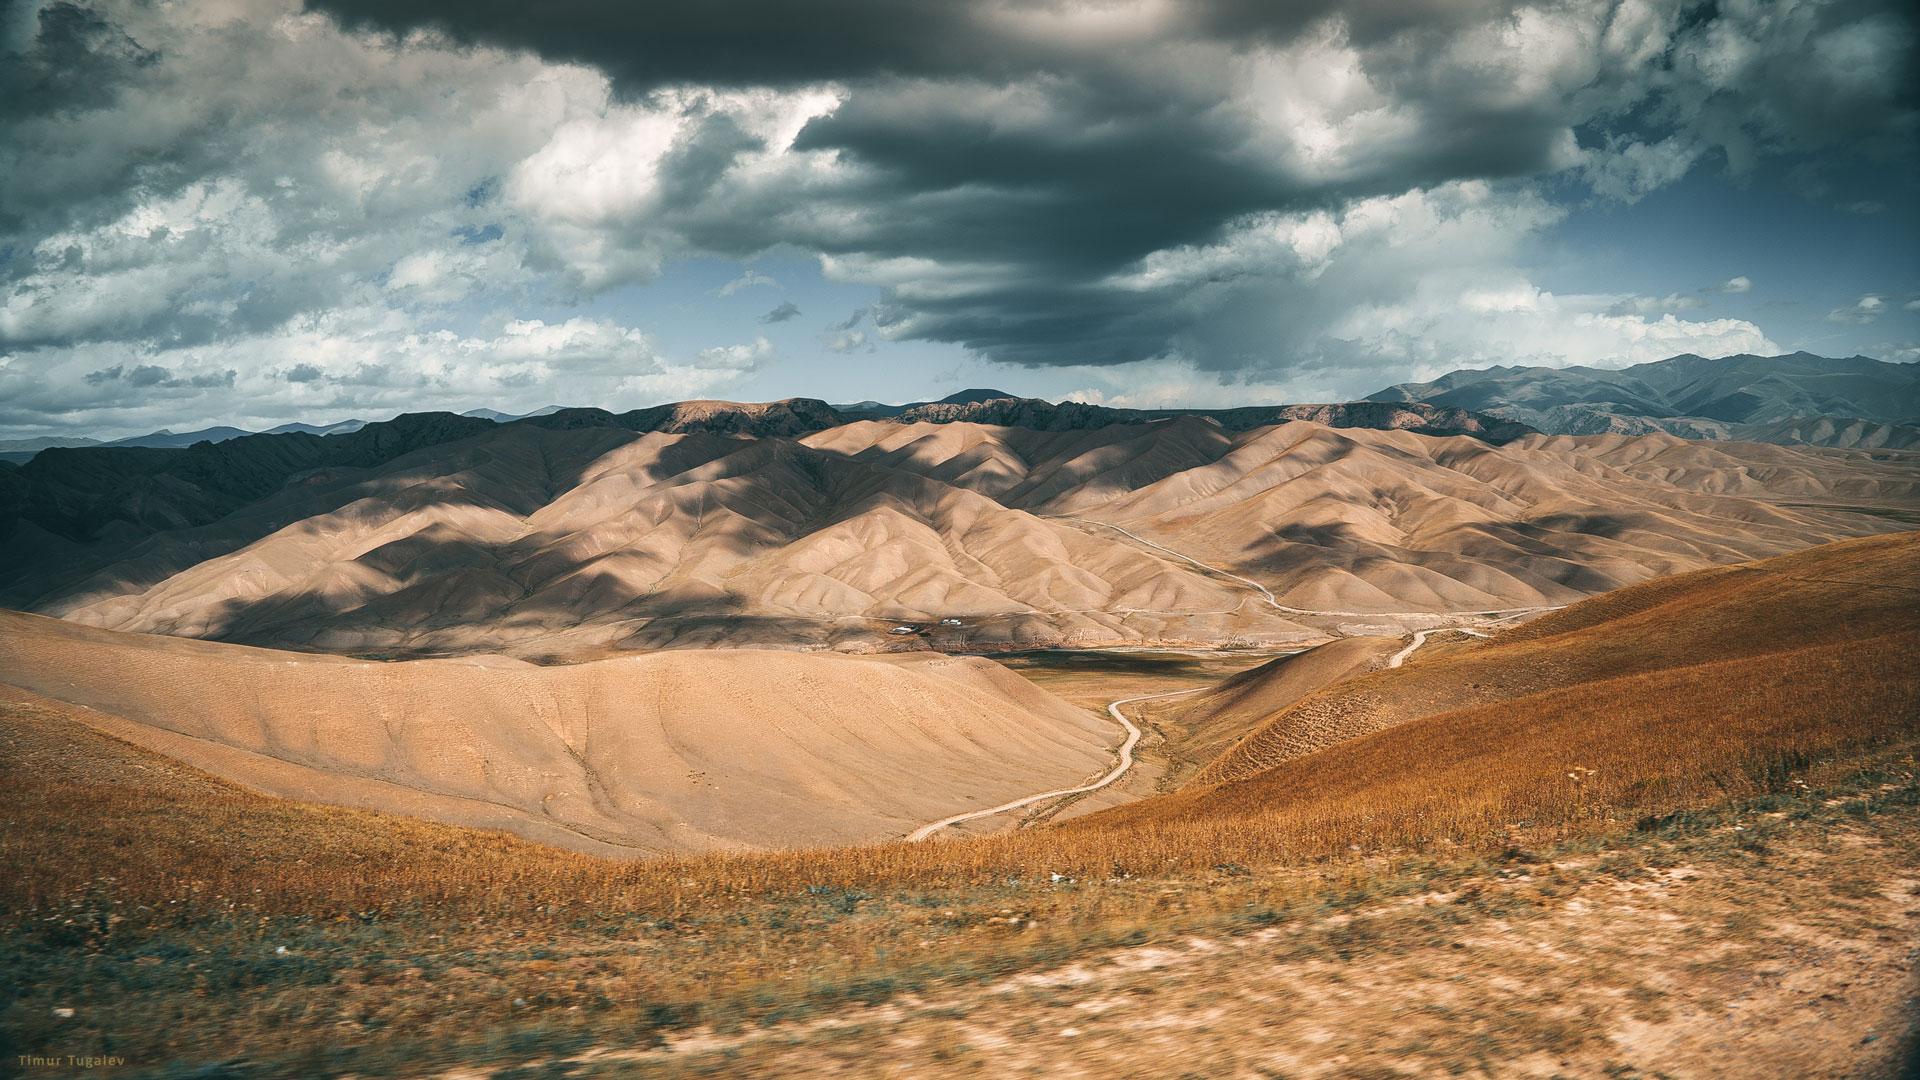 desert-timur-tugalev